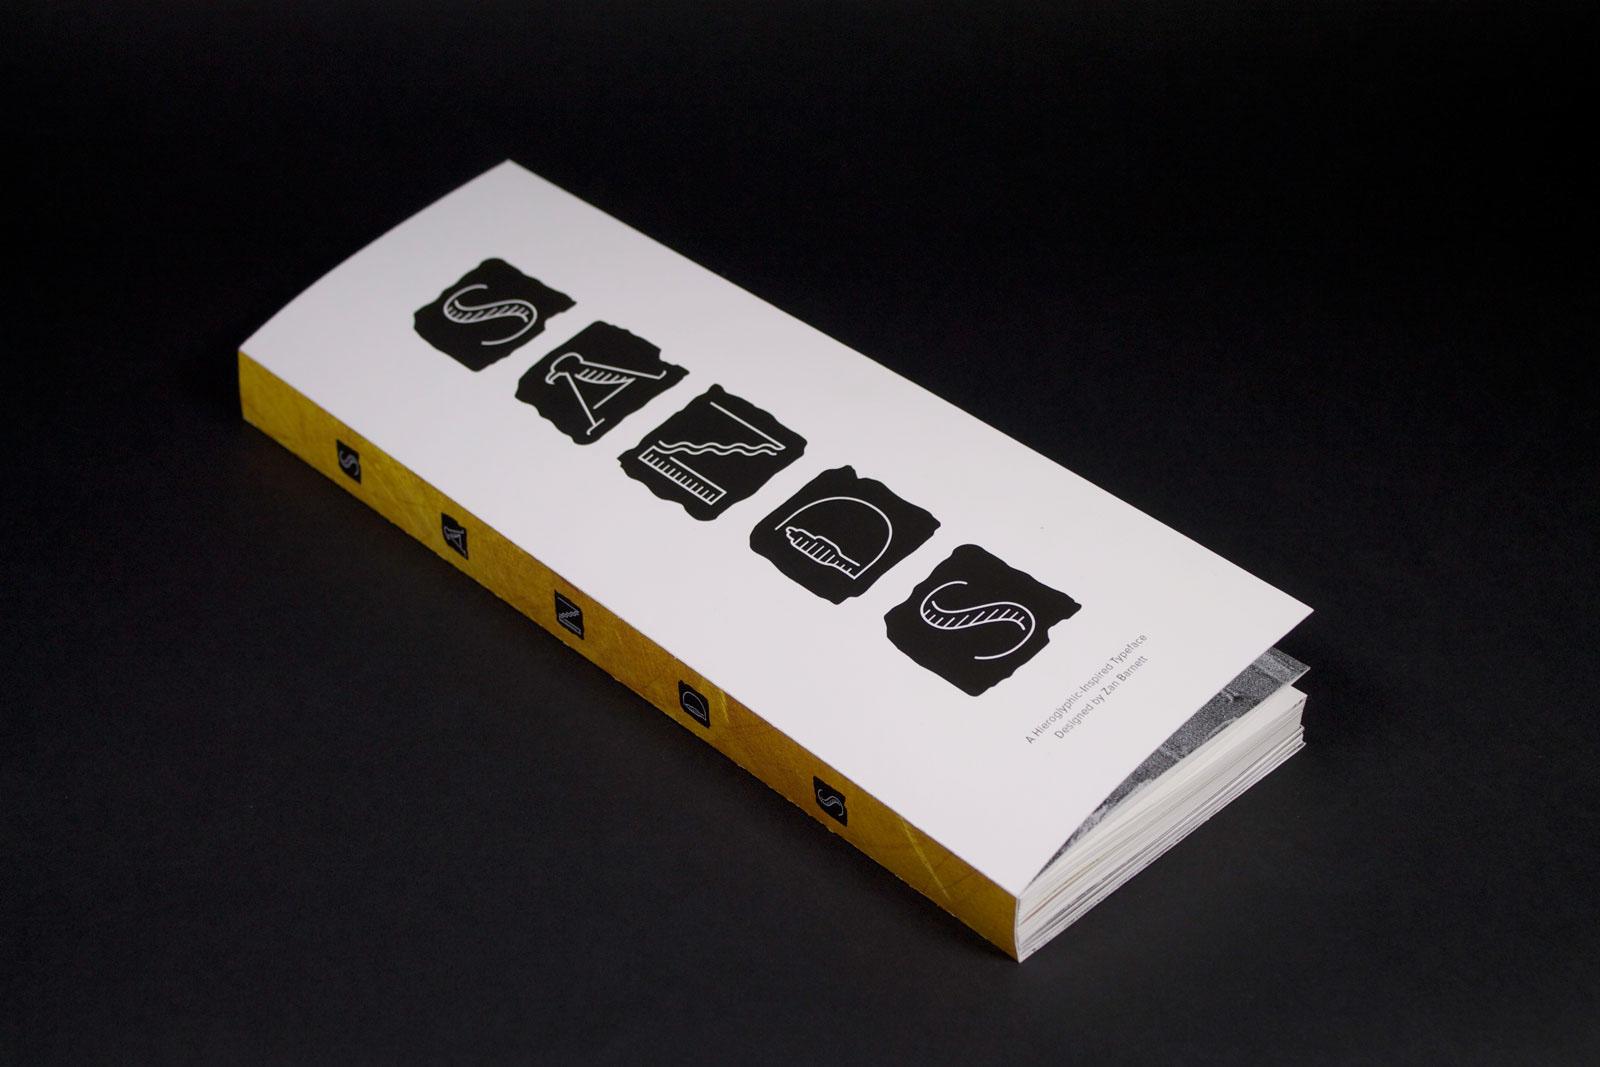 ZanBarnett-Sands-Book1a.jpg